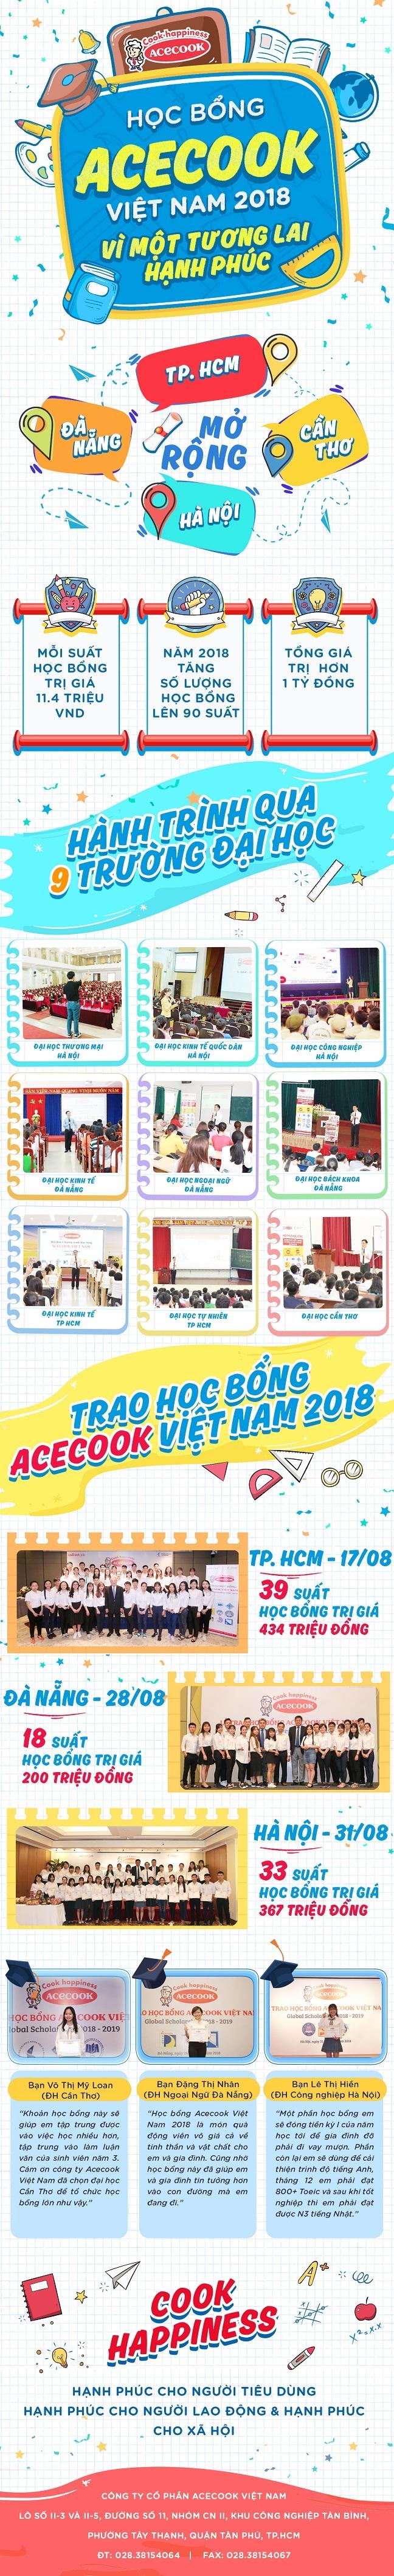 Acecook Viet Nam va hanh trinh dong hanh cung sinh vien Viet Nam